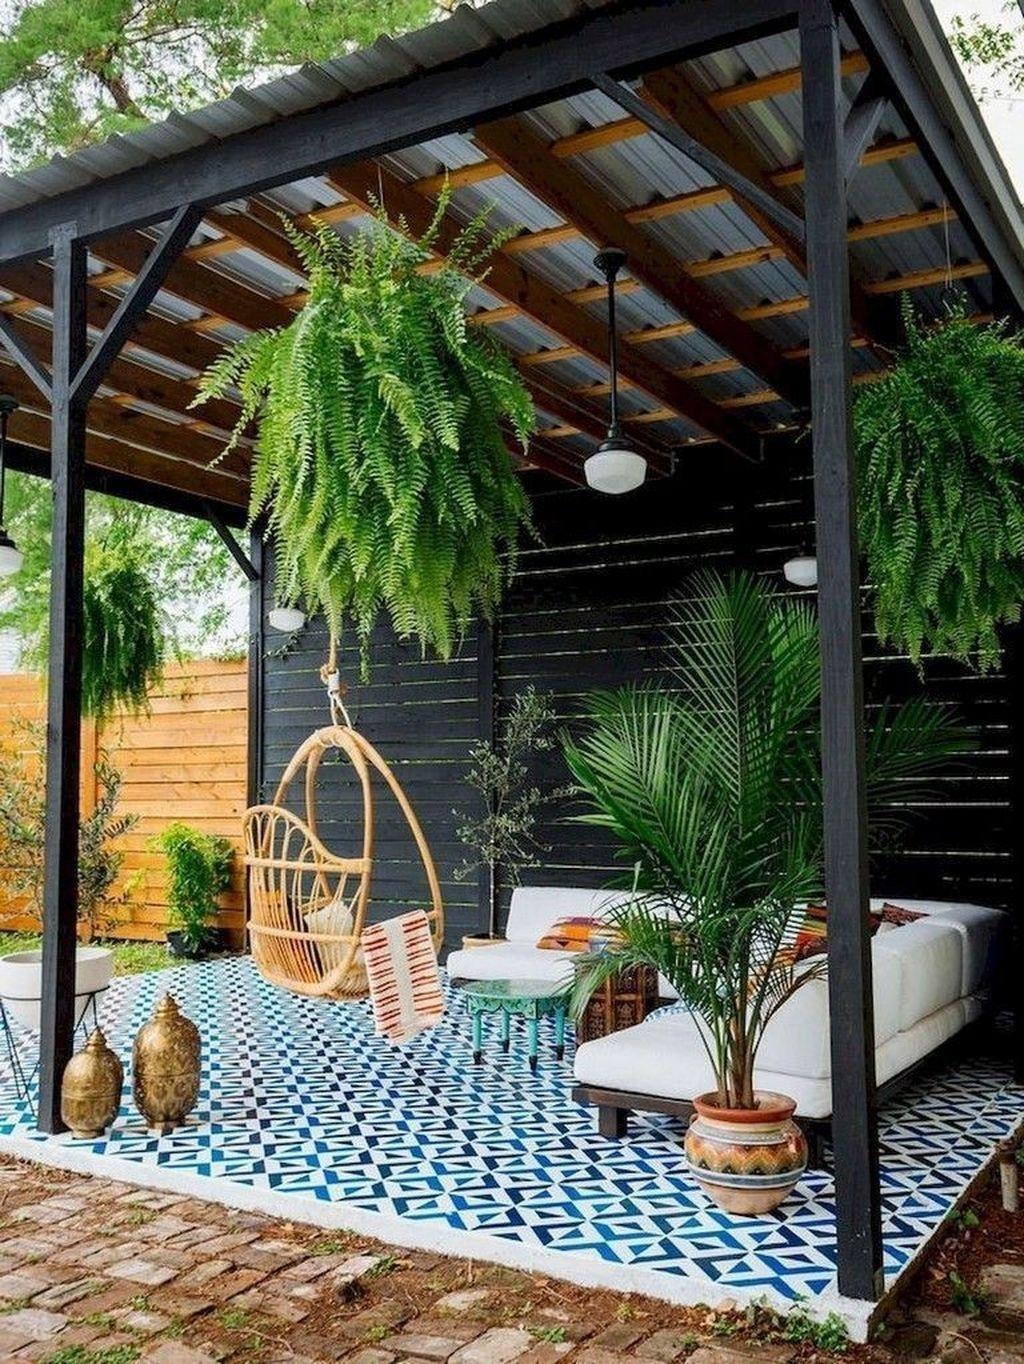 46 gorgeous small backyard landscaping ideas outdoor on gorgeous small backyard landscaping ideas id=62905